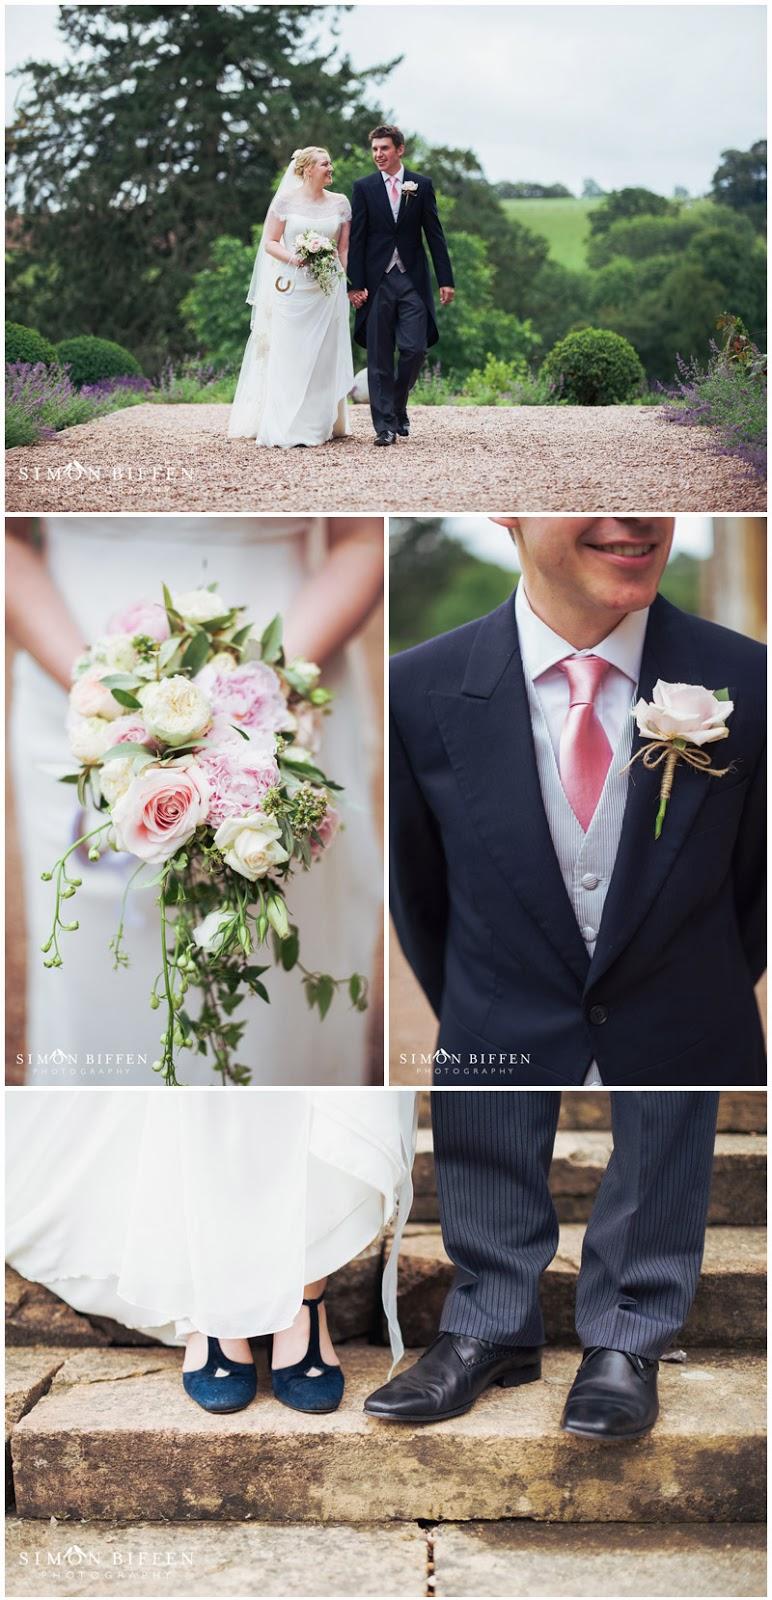 Huntsham Court wedding photography bride and groom